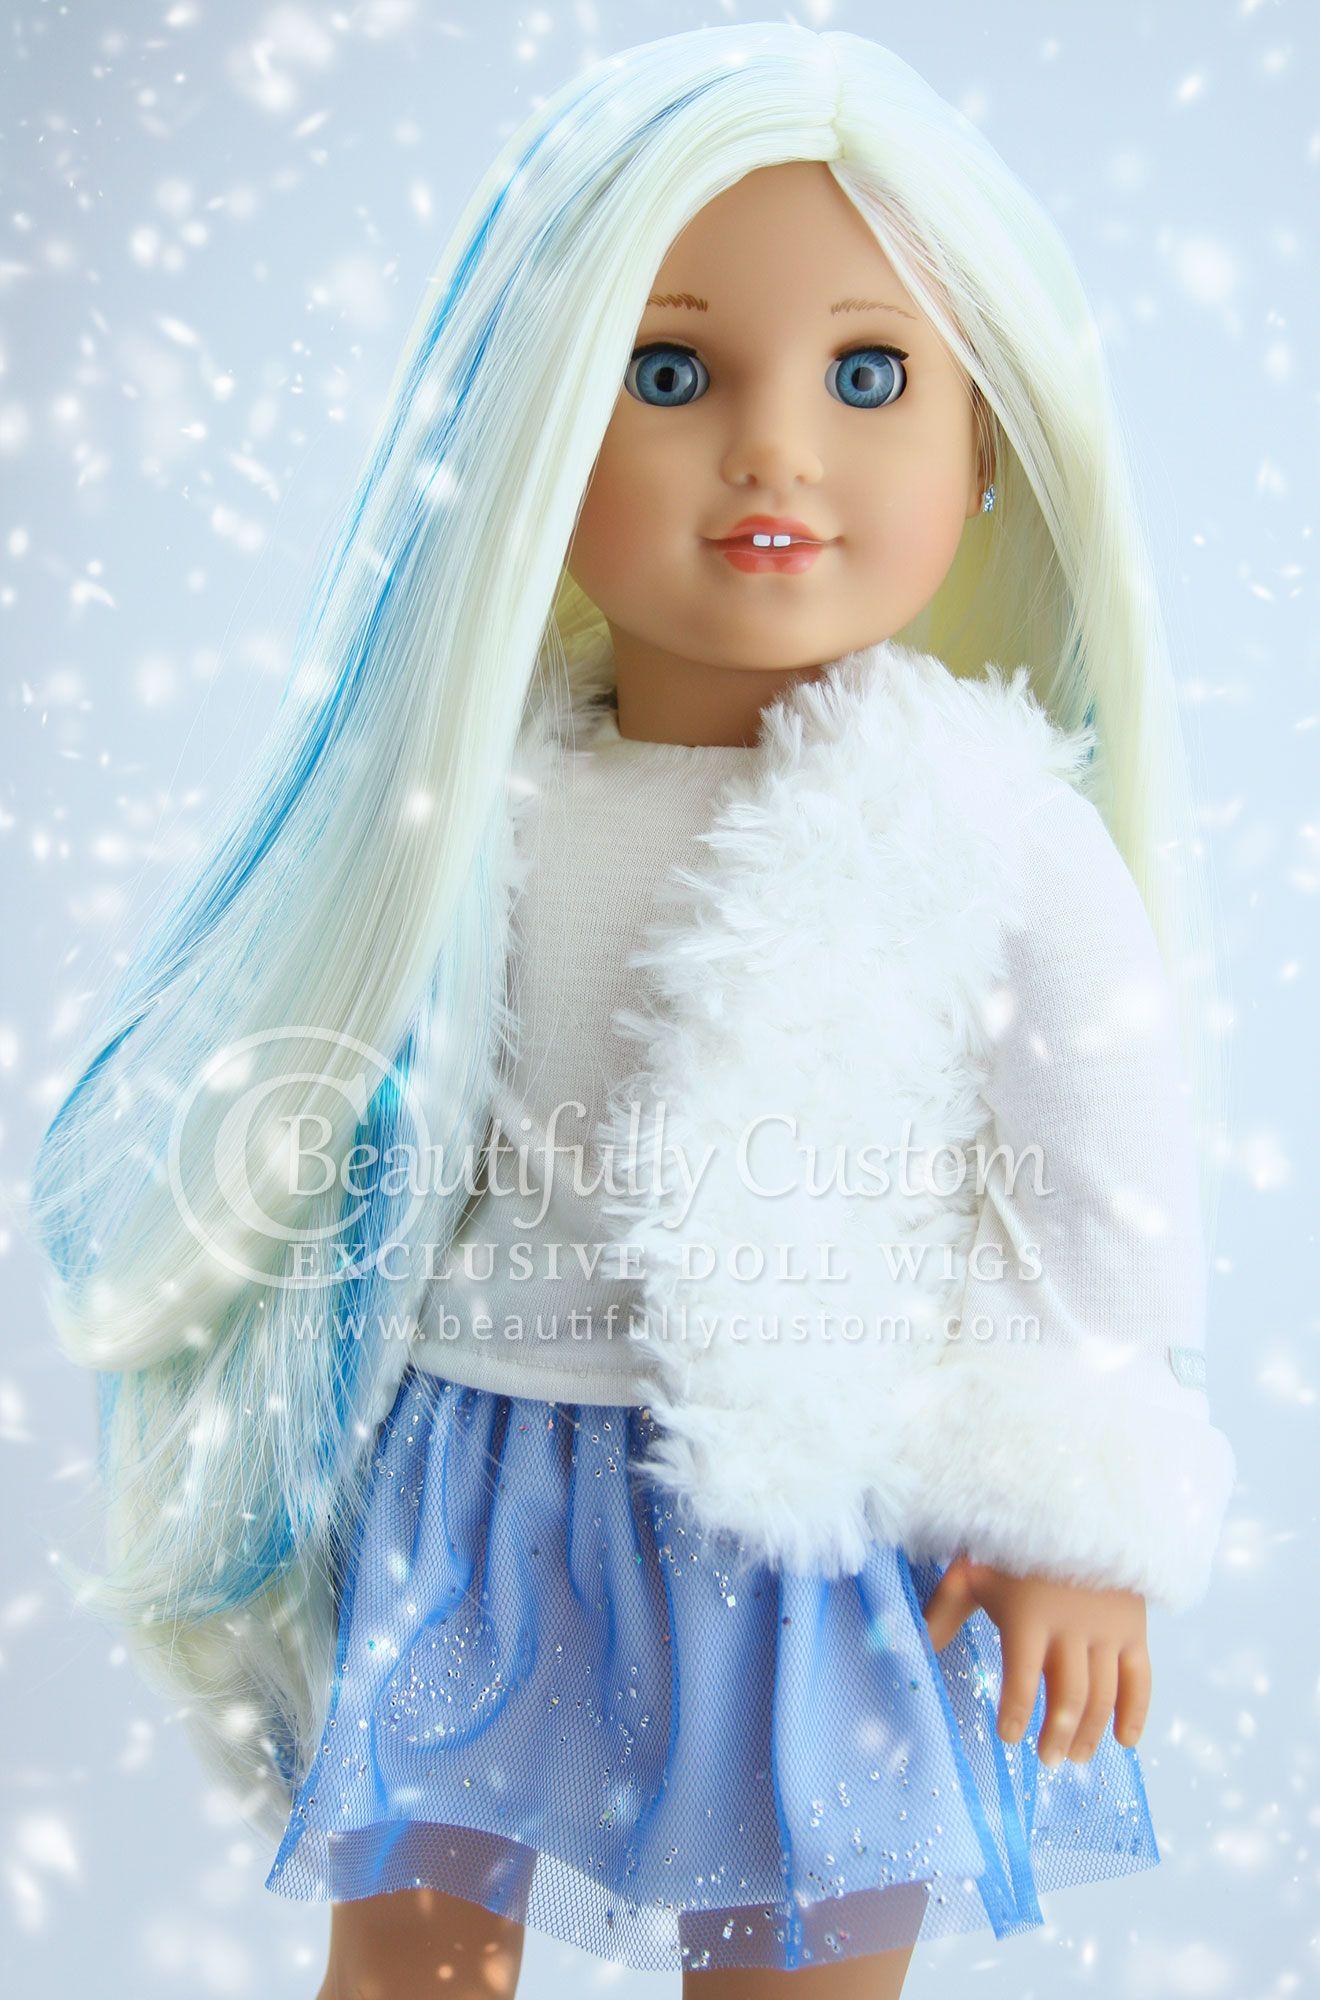 Frost Unicorn Deluxe Elegance Doll Wig for Custom American Girl